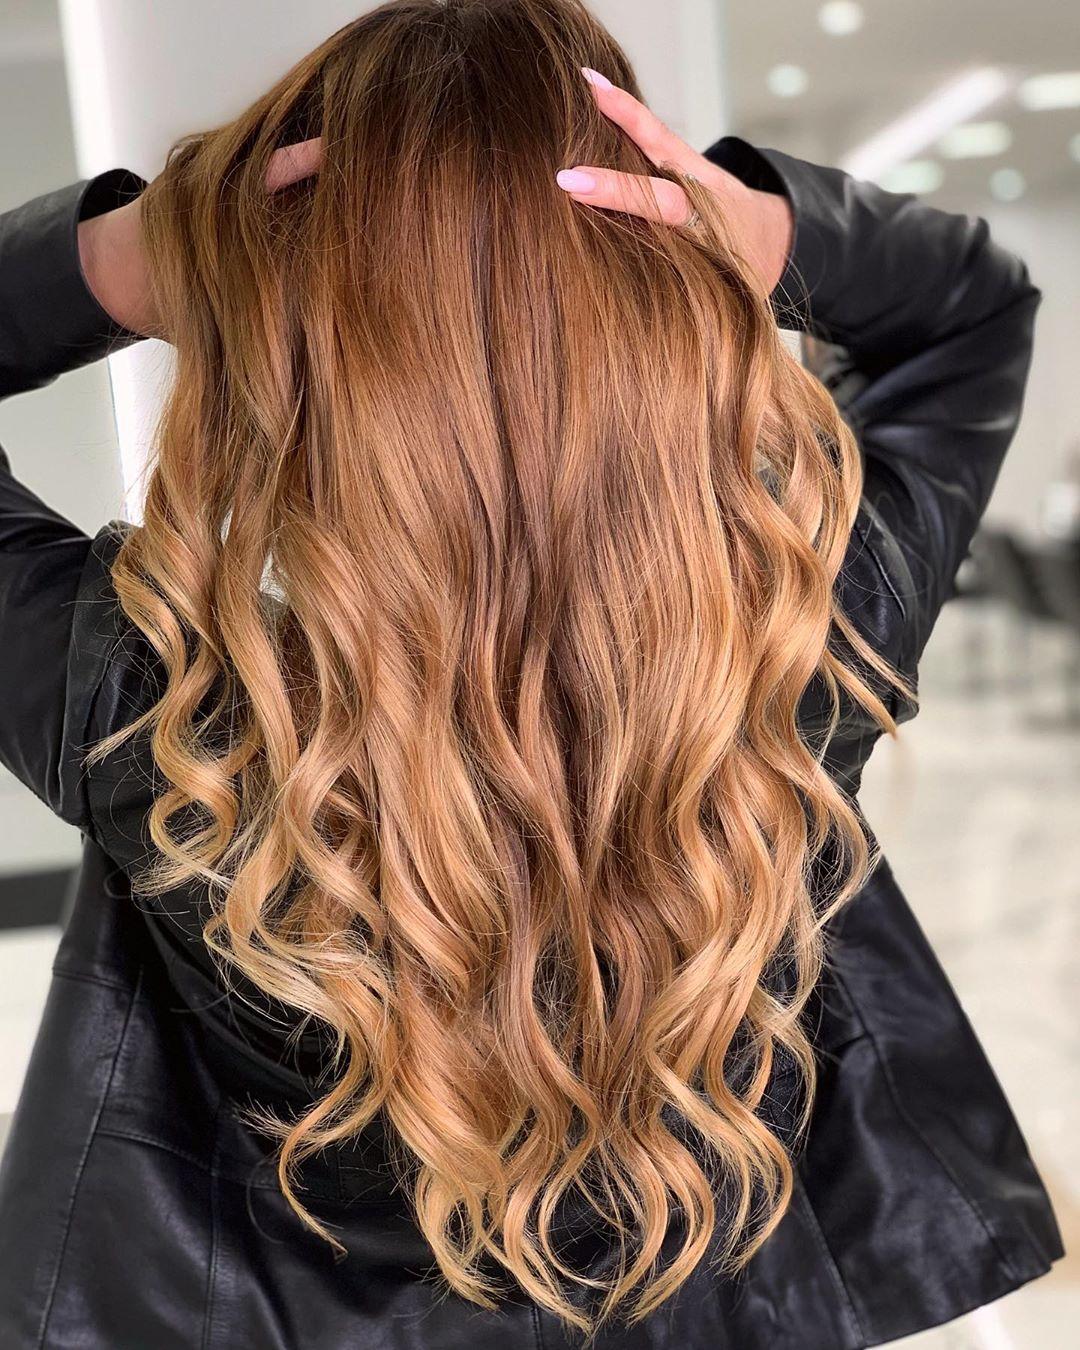 dyesign-salon-roma-hairstyle